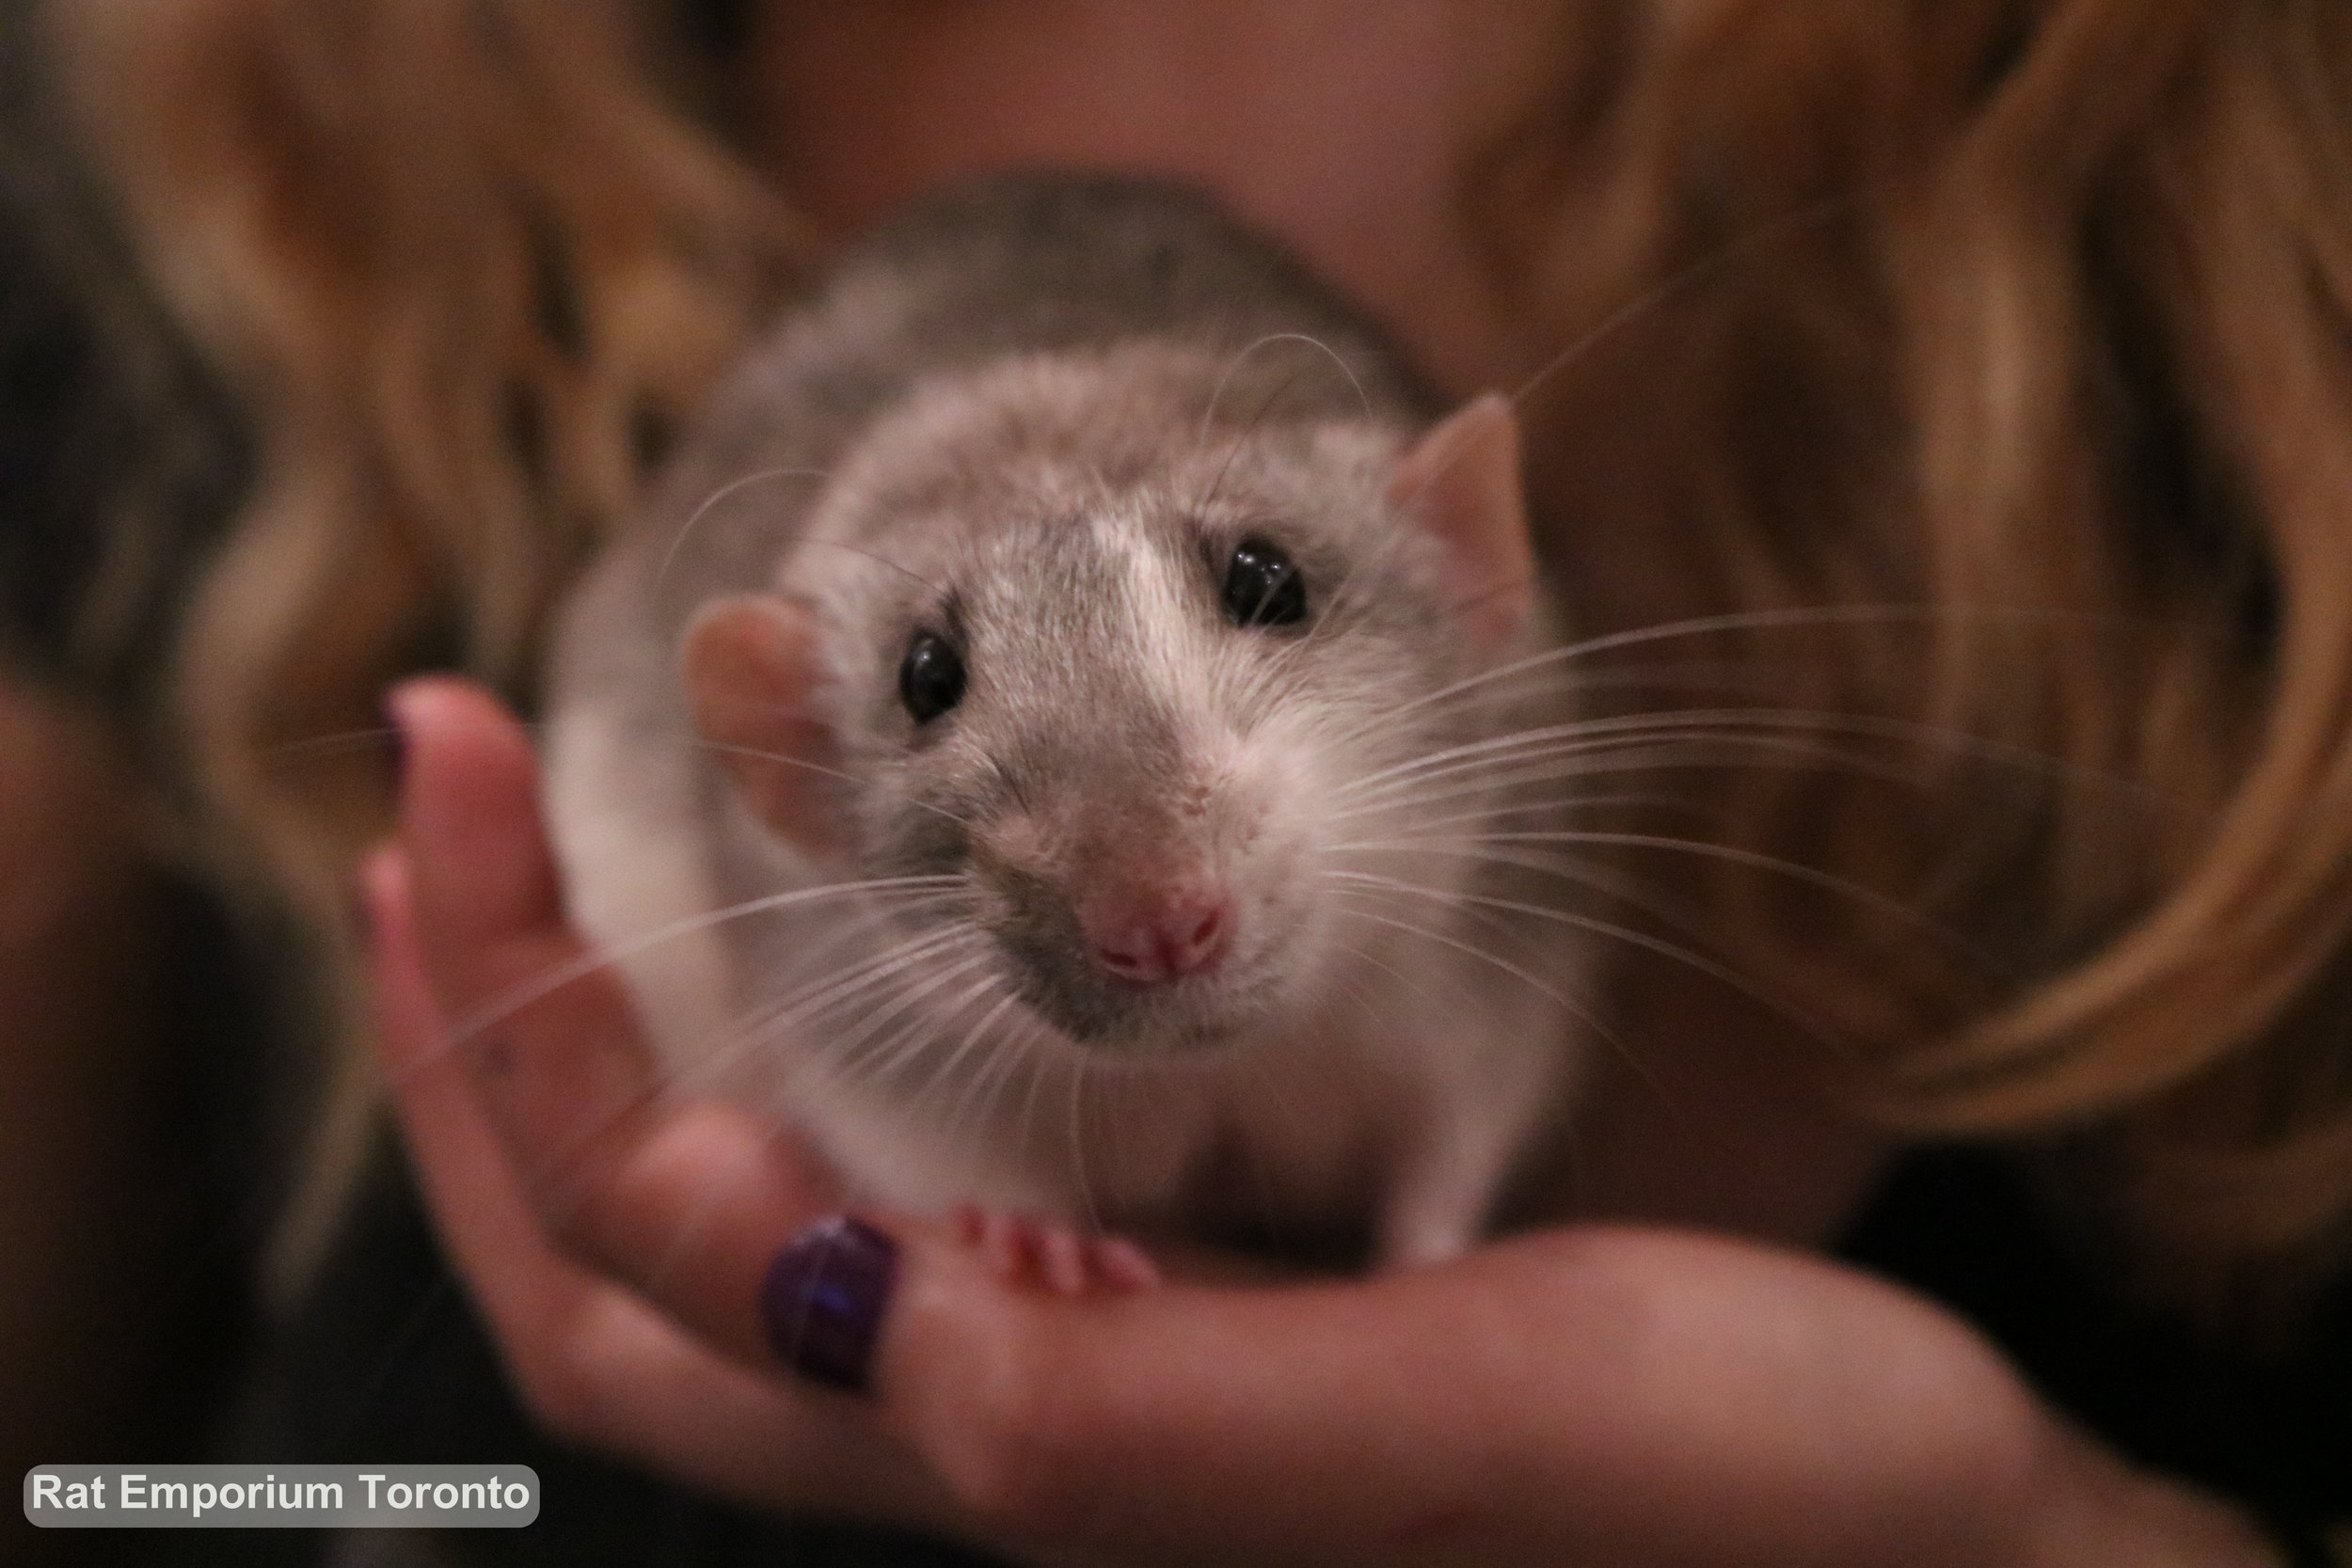 silver agouti dumbo rat, born at the Rat Emporium Toronto - adopt pet rats Toronto - rat breeder